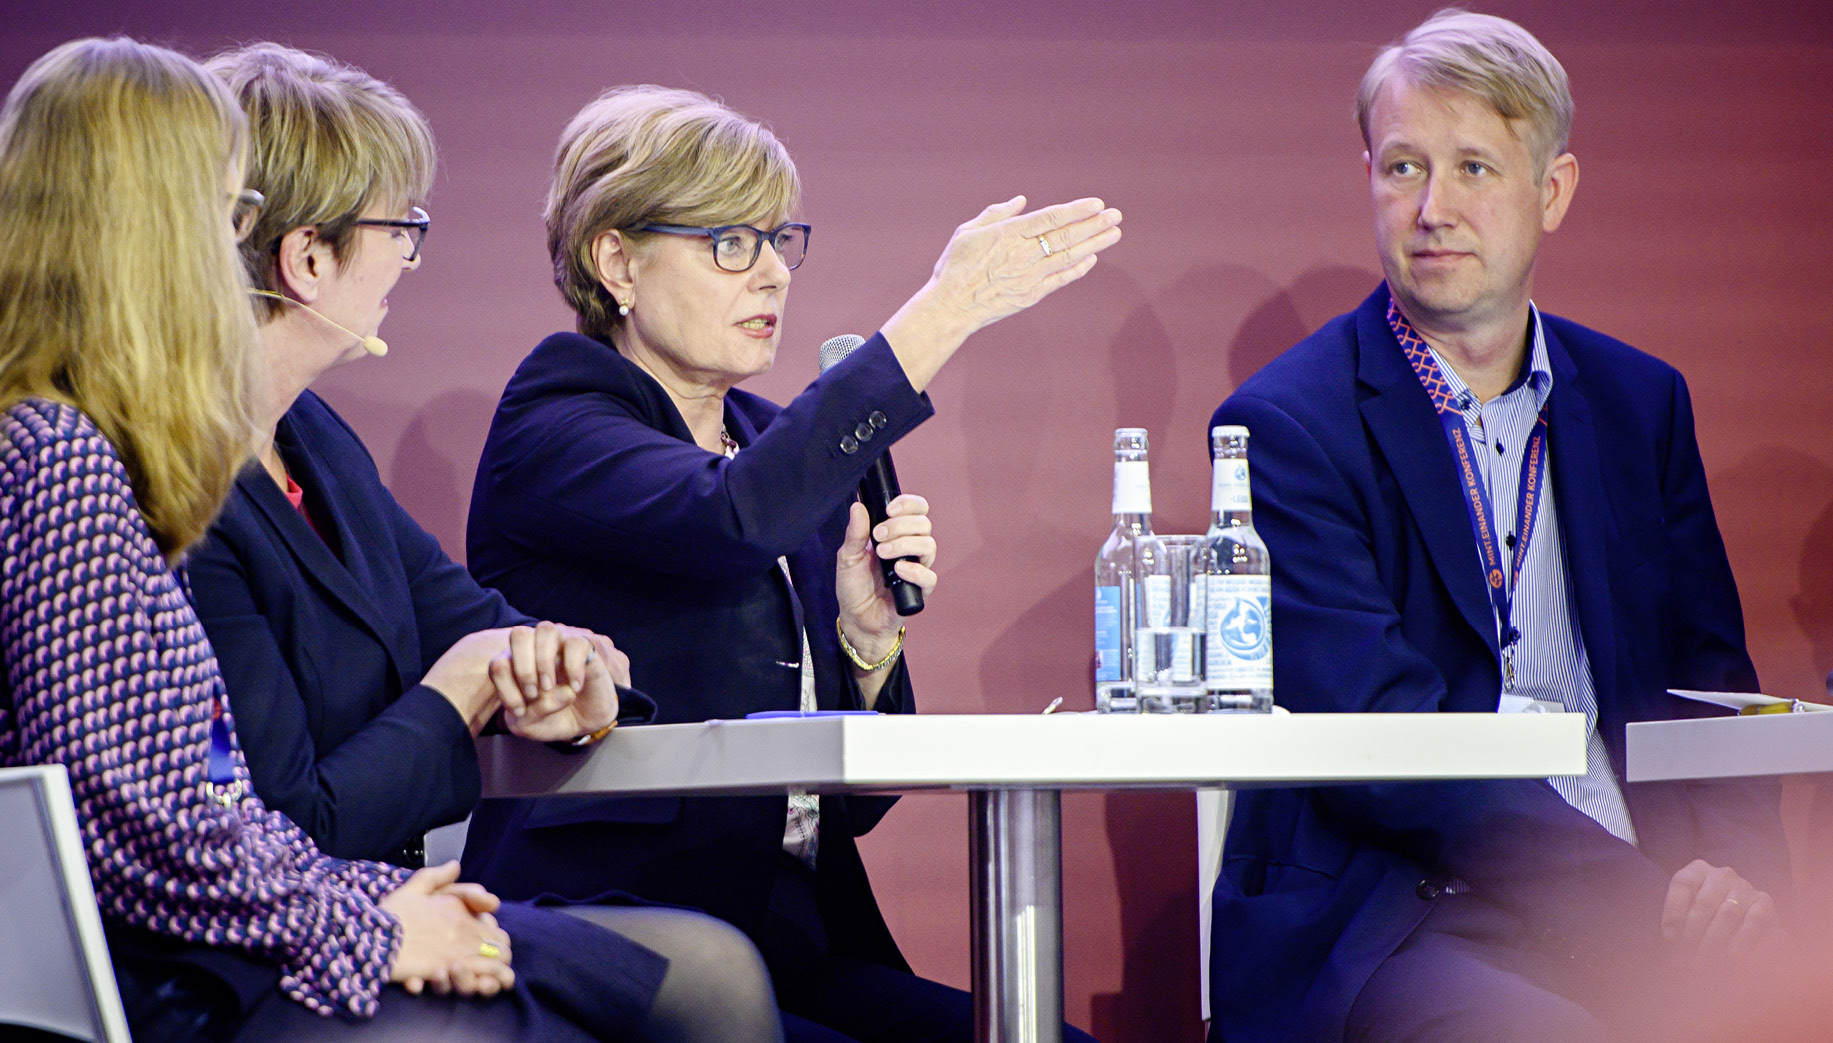 Auf dem Podium: Moderatorin Judith Schulte- Loh (WDR), Helga Lukoschat (EAF), Christian Berg (AllBright)